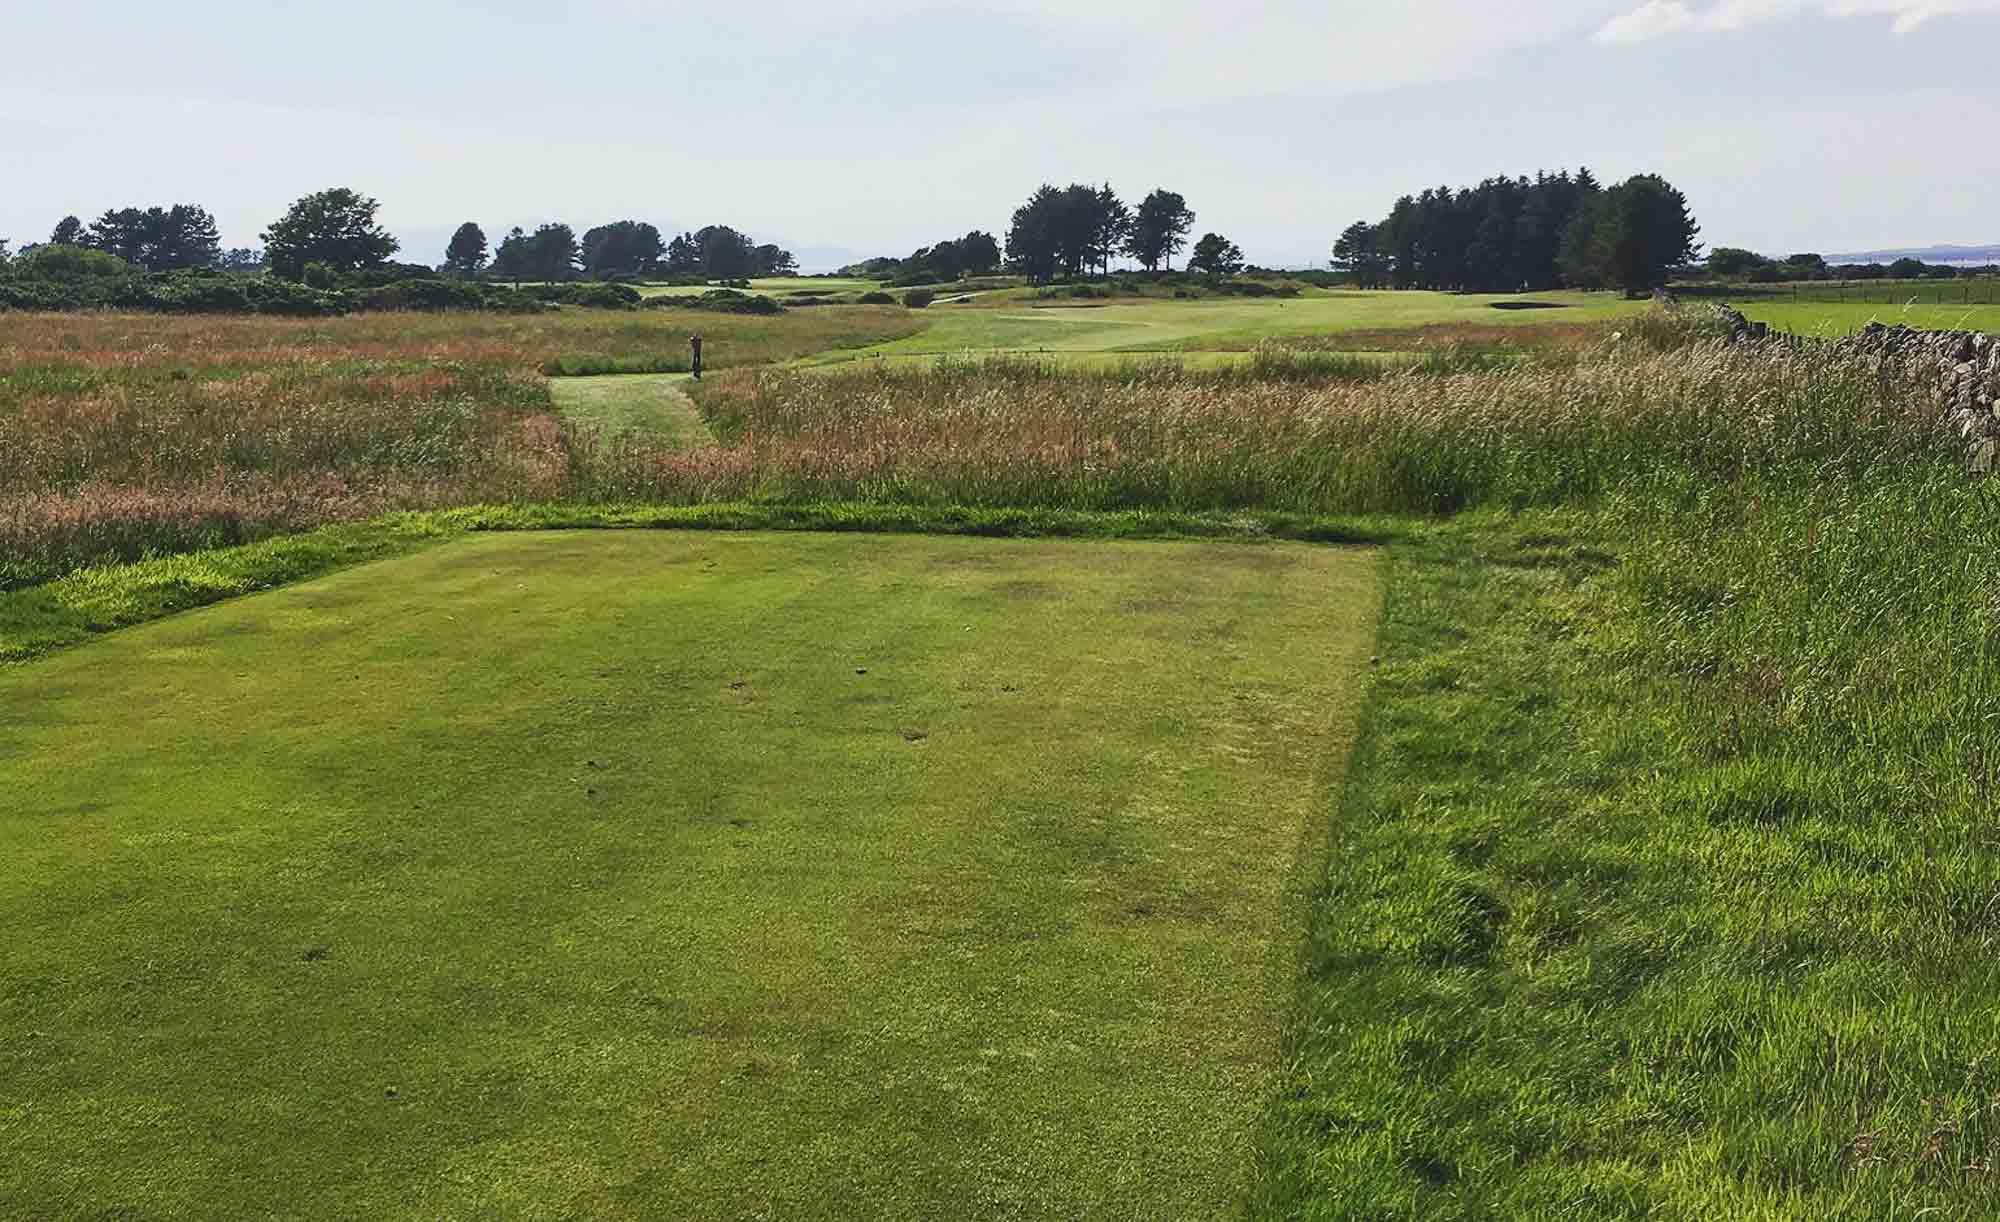 A photo of the Kilmarnock Barassie Golf Club in Ayrshire, Scotland.